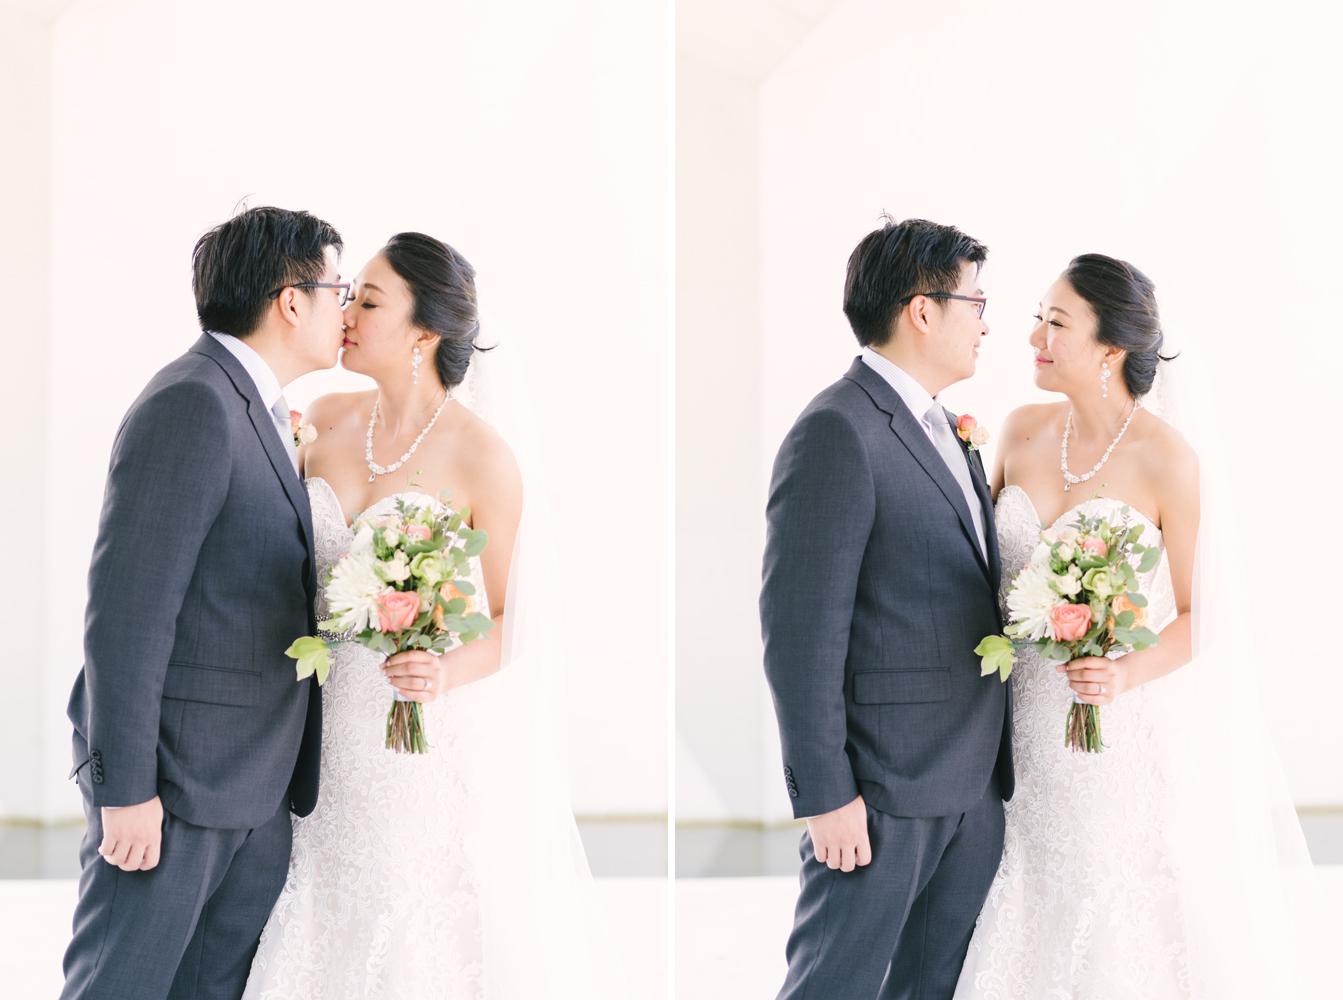 ubc-wedding-15.jpg